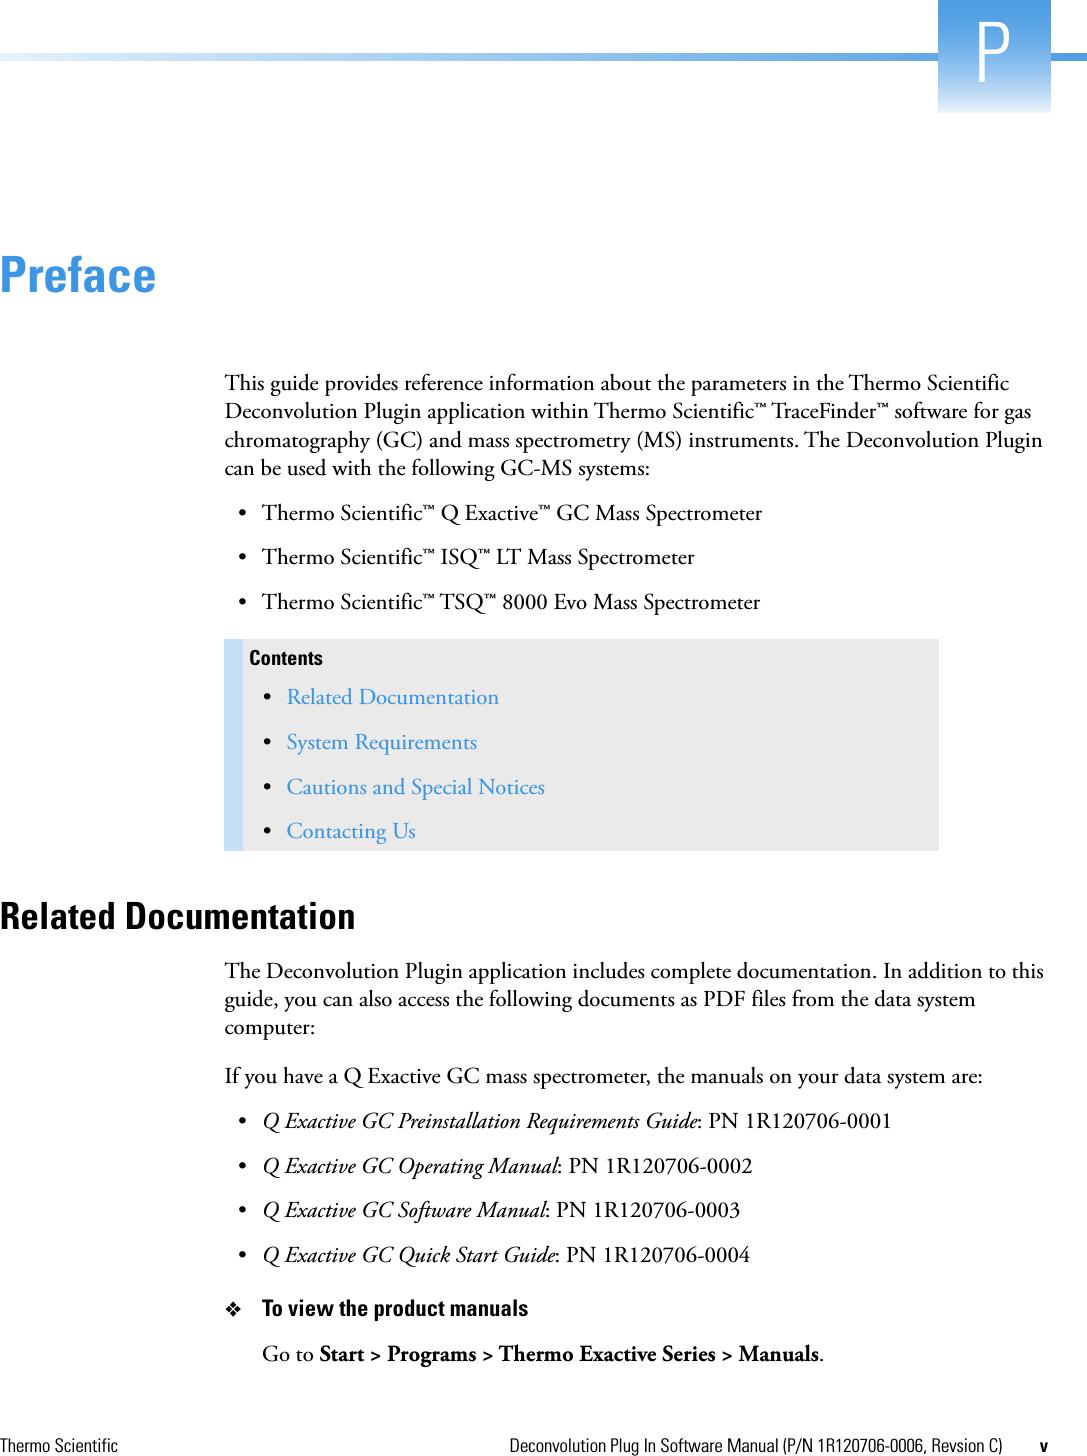 1R120706 0006_RevA Deconvolution Plugin Software Manual